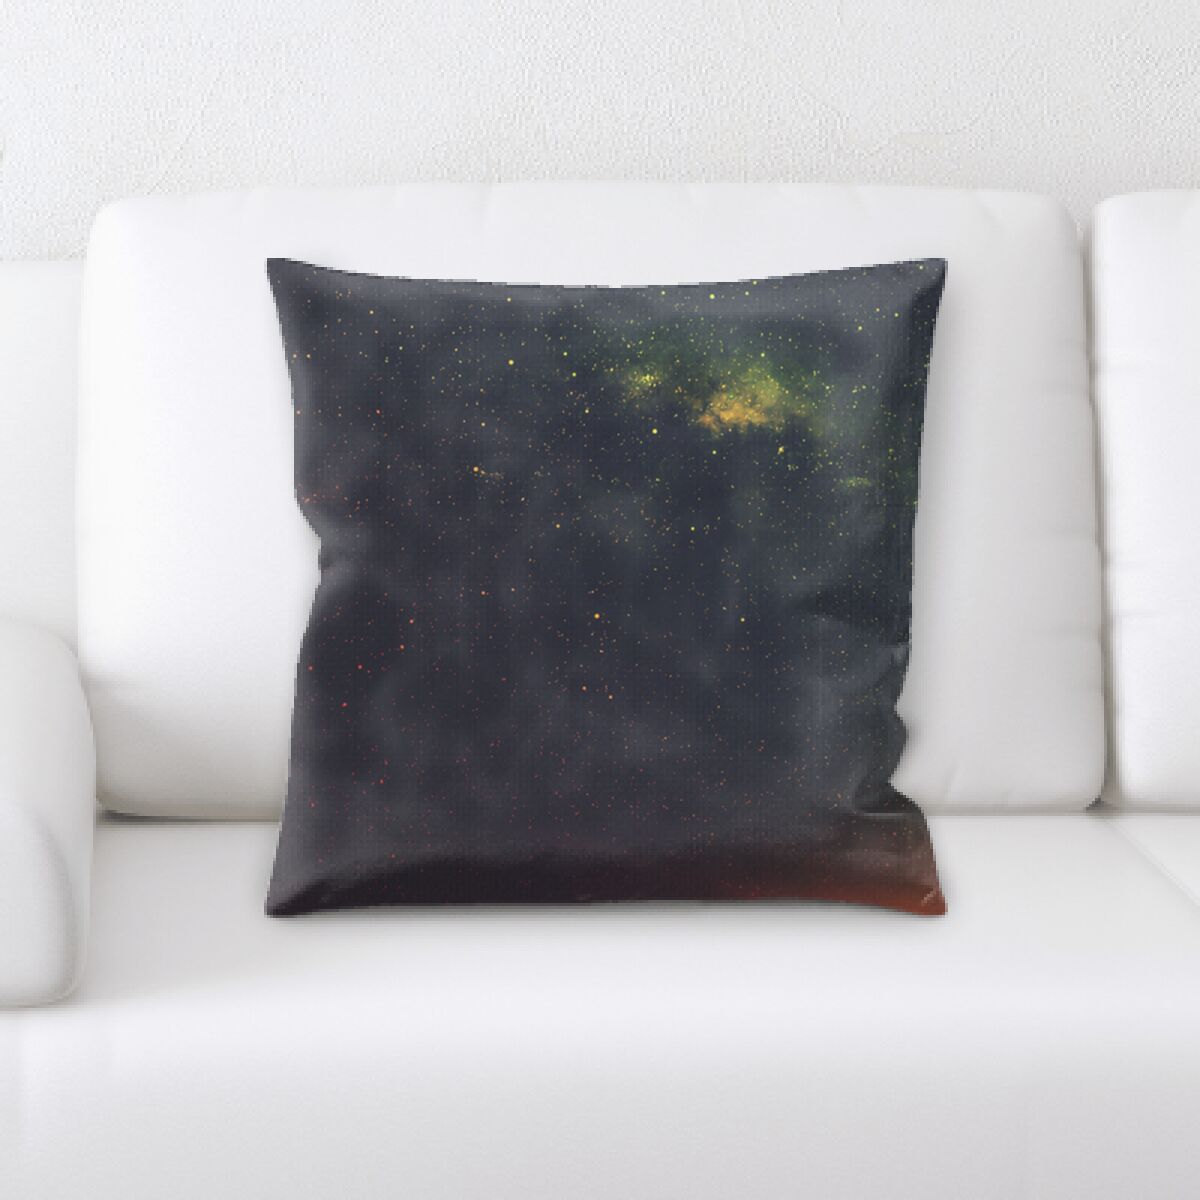 Stringer 3 Throw Pillow